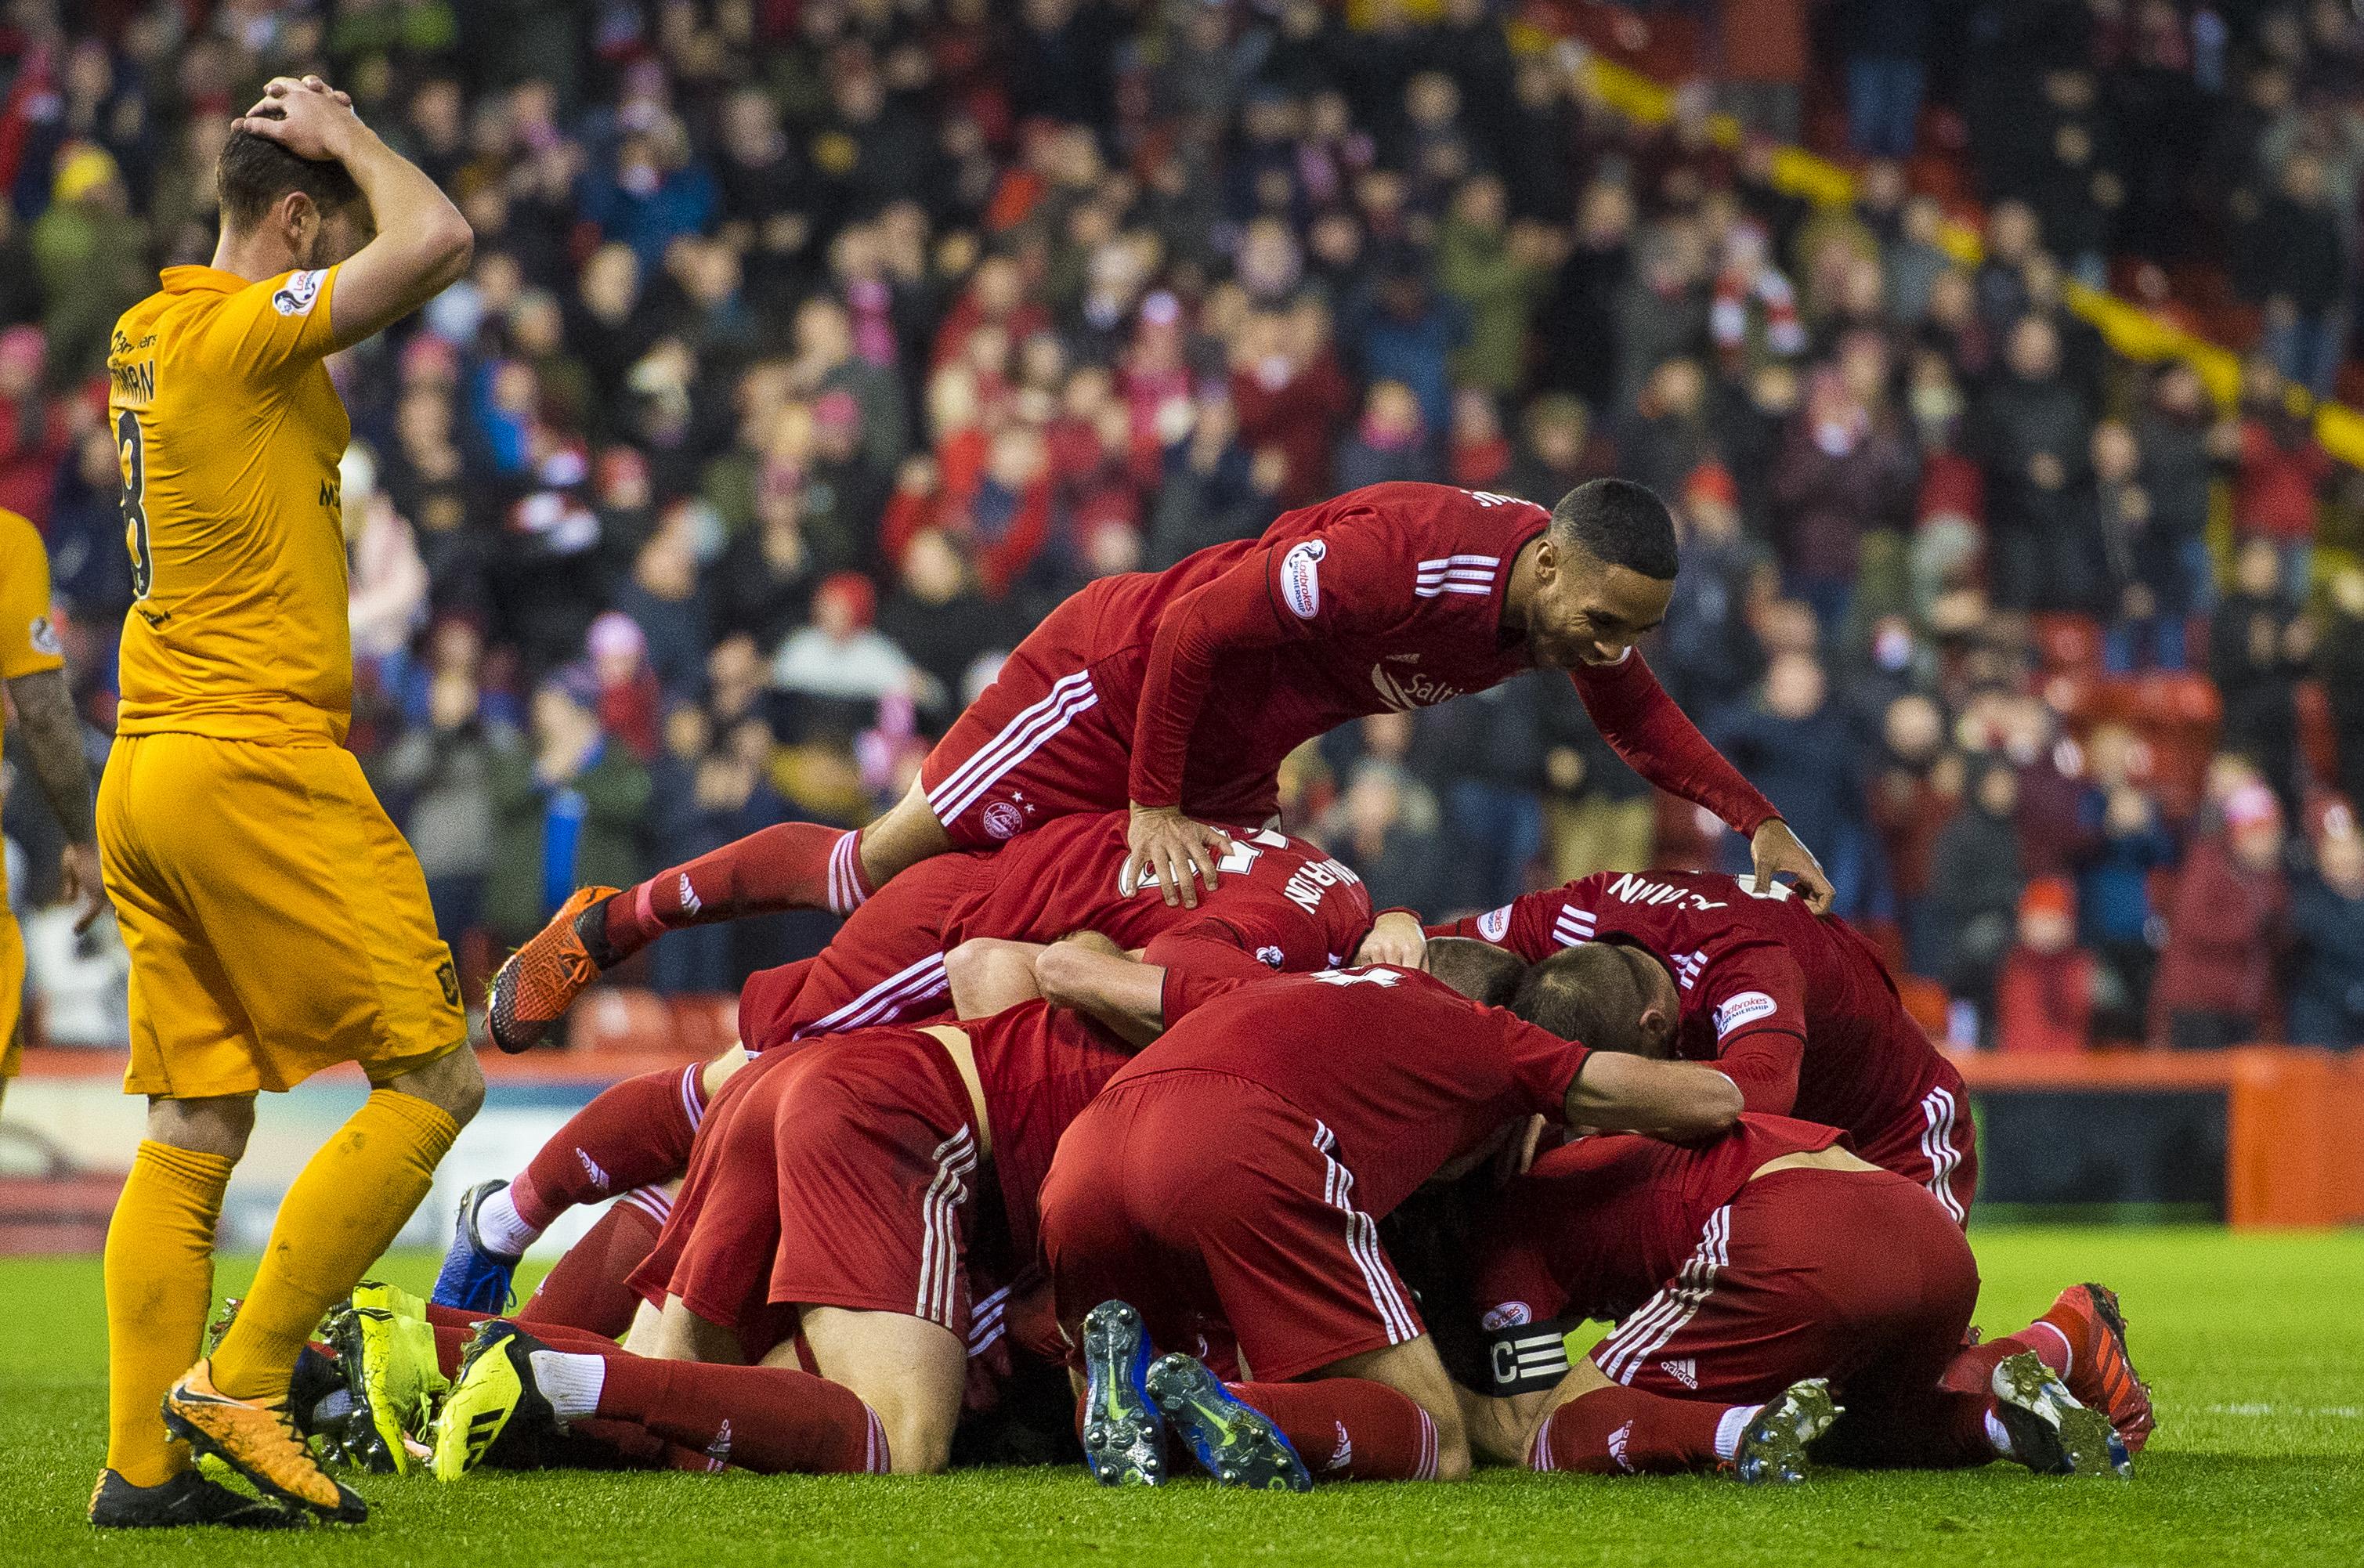 Aberdeen celebrate the late winner (SNS Group / Alan Harvey)